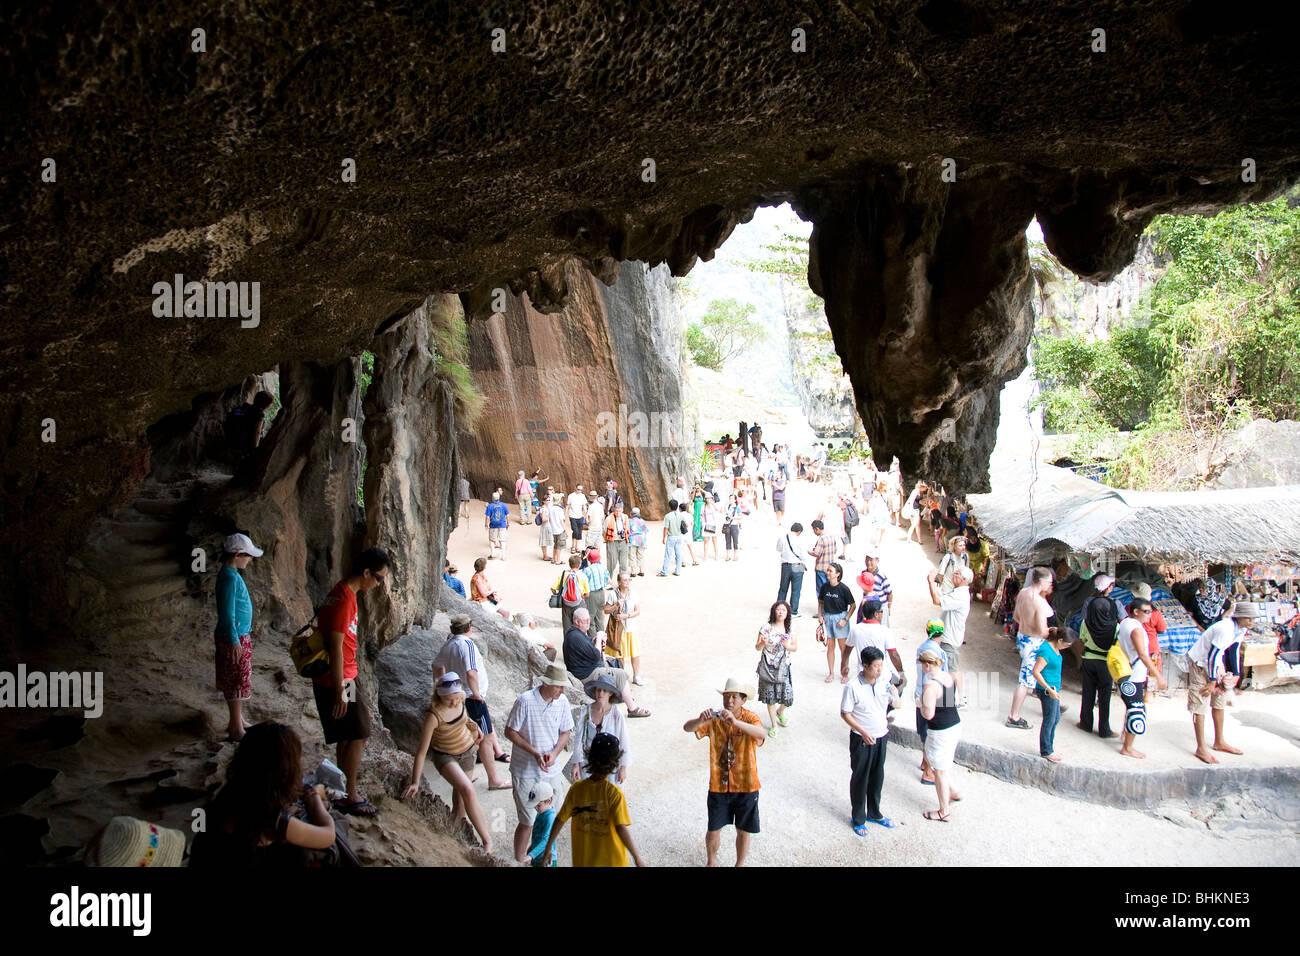 Exploring Caves At James Bond Island Stock Photo 28093467